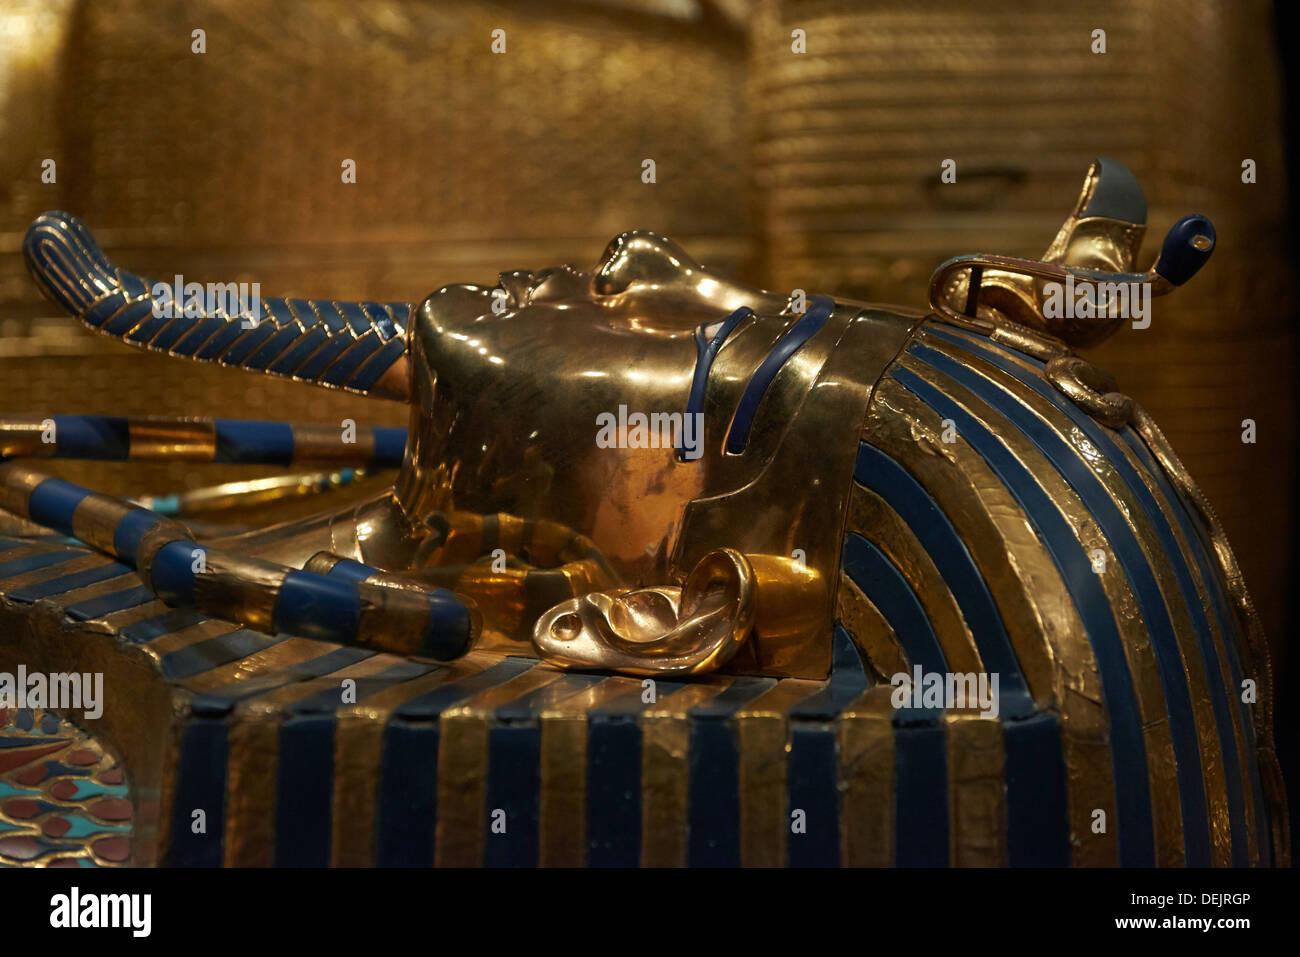 Tutankhamun King Tut Tomb Treasures Stock Photos ... |King Tut And His Treasures